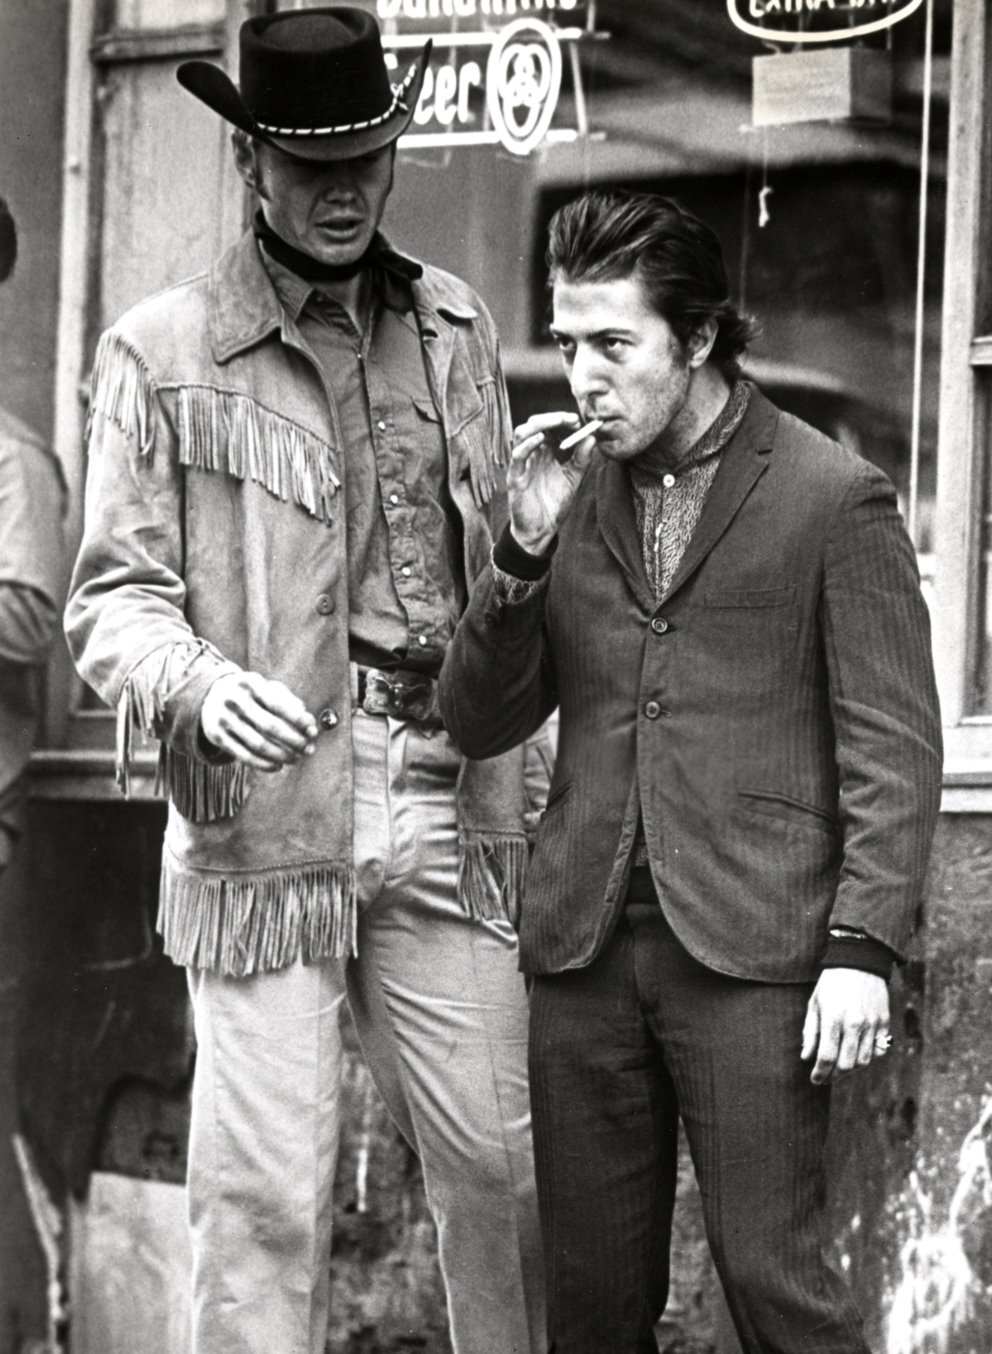 Midnight Cowboy (1969) | Dustin hoffman, The best films, Movies